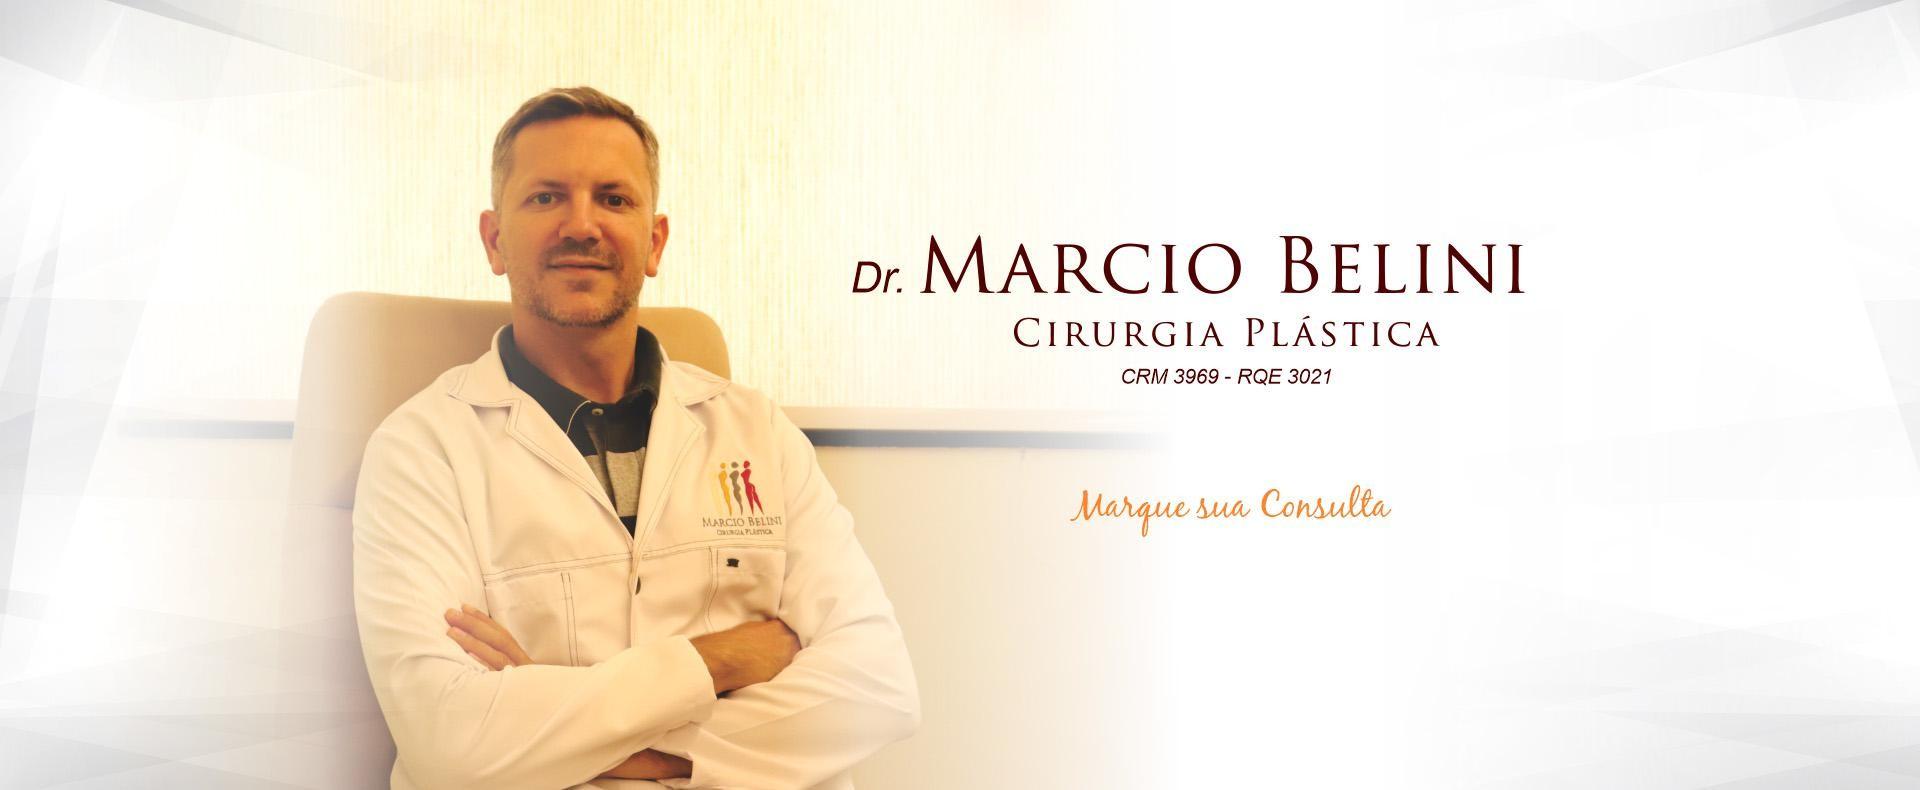 slides/2019/05/dr-marcio-belini.jpg